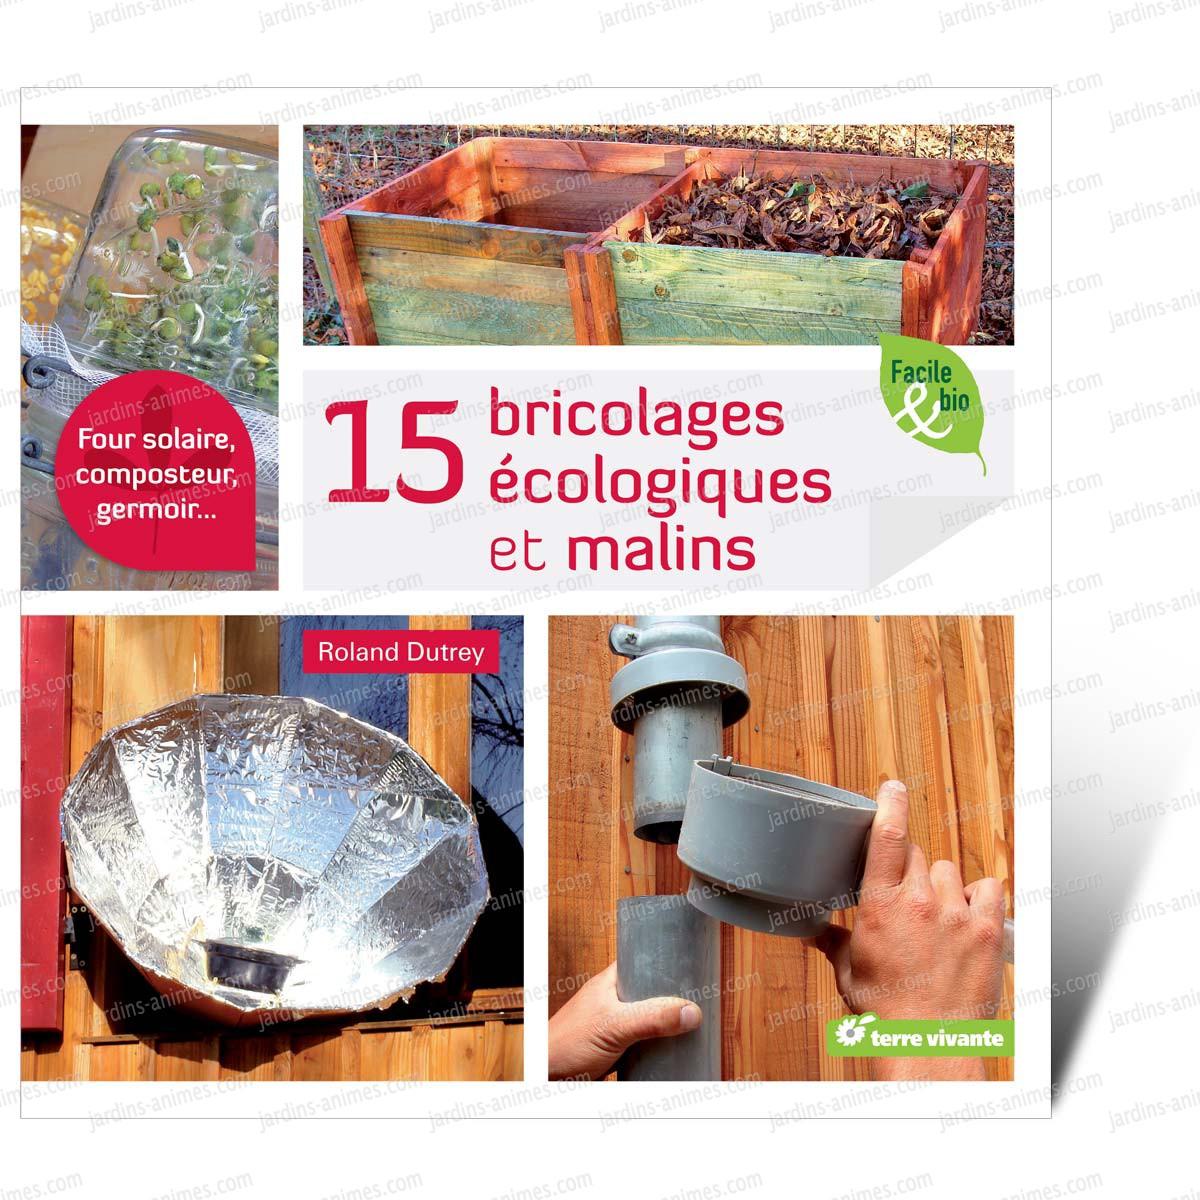 15 bricolages cologiques et malins livre terre vivante livres jardin bio. Black Bedroom Furniture Sets. Home Design Ideas